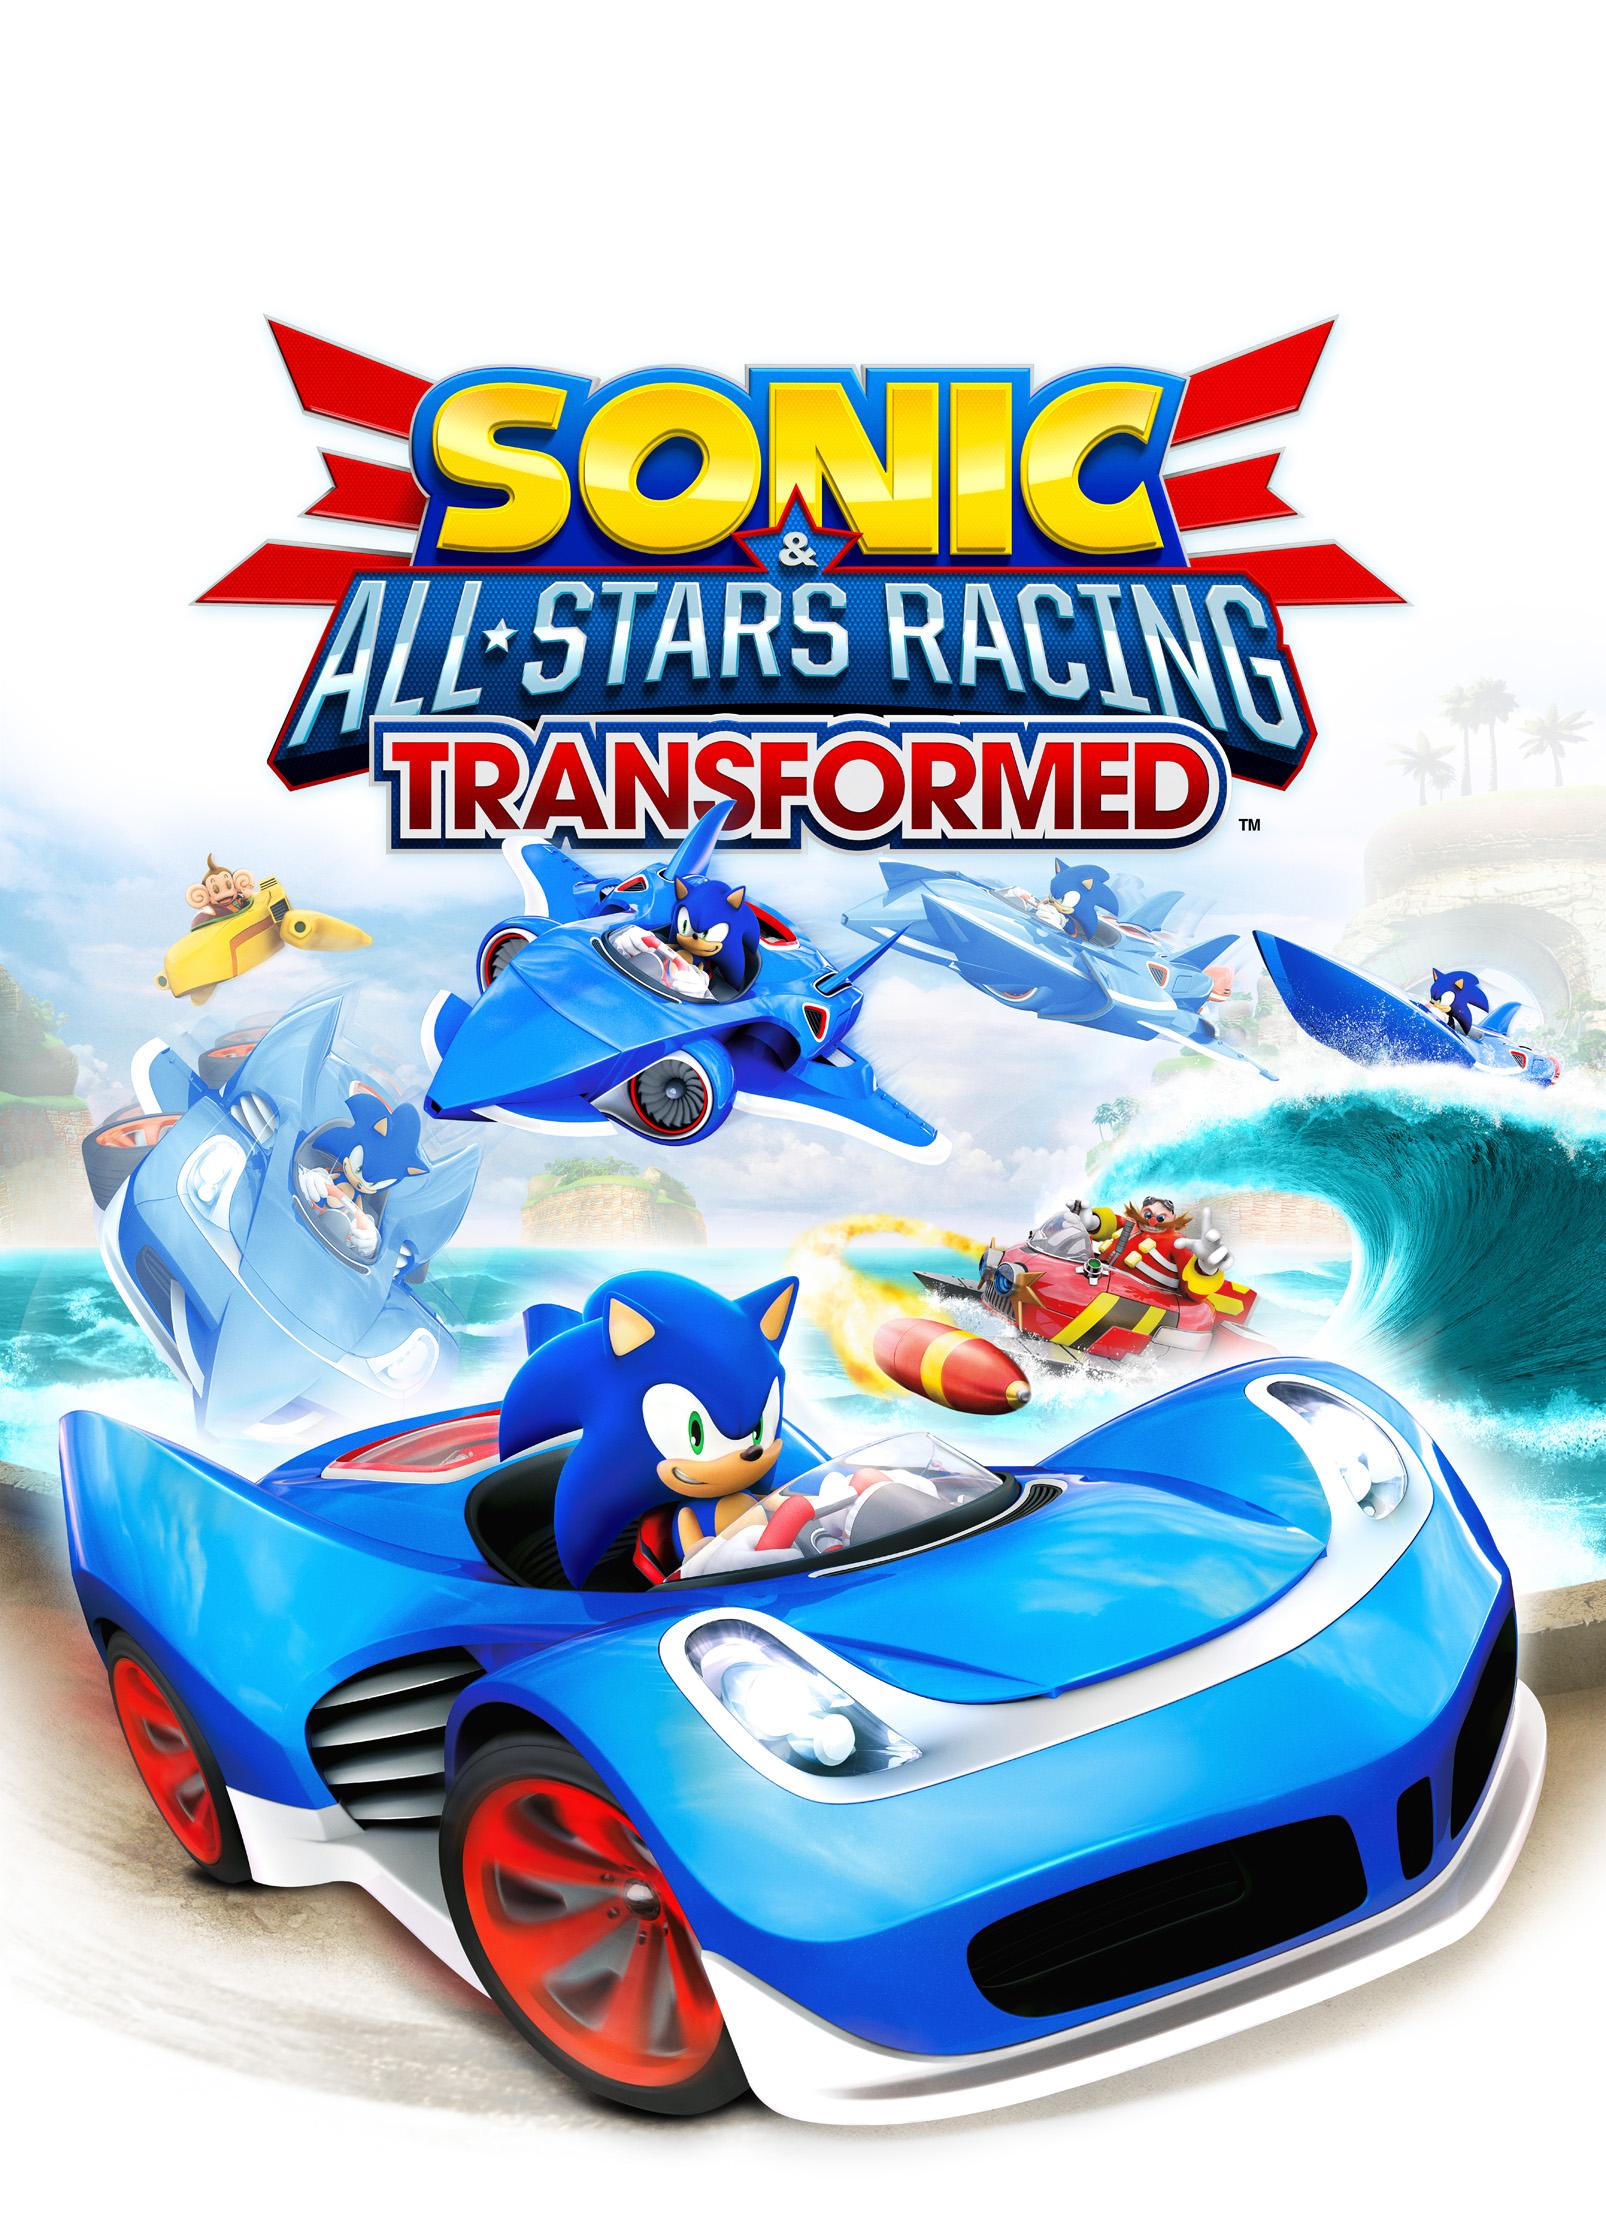 Sonic & All-Stars Racing Transformed | Sonic News Network | FANDOM